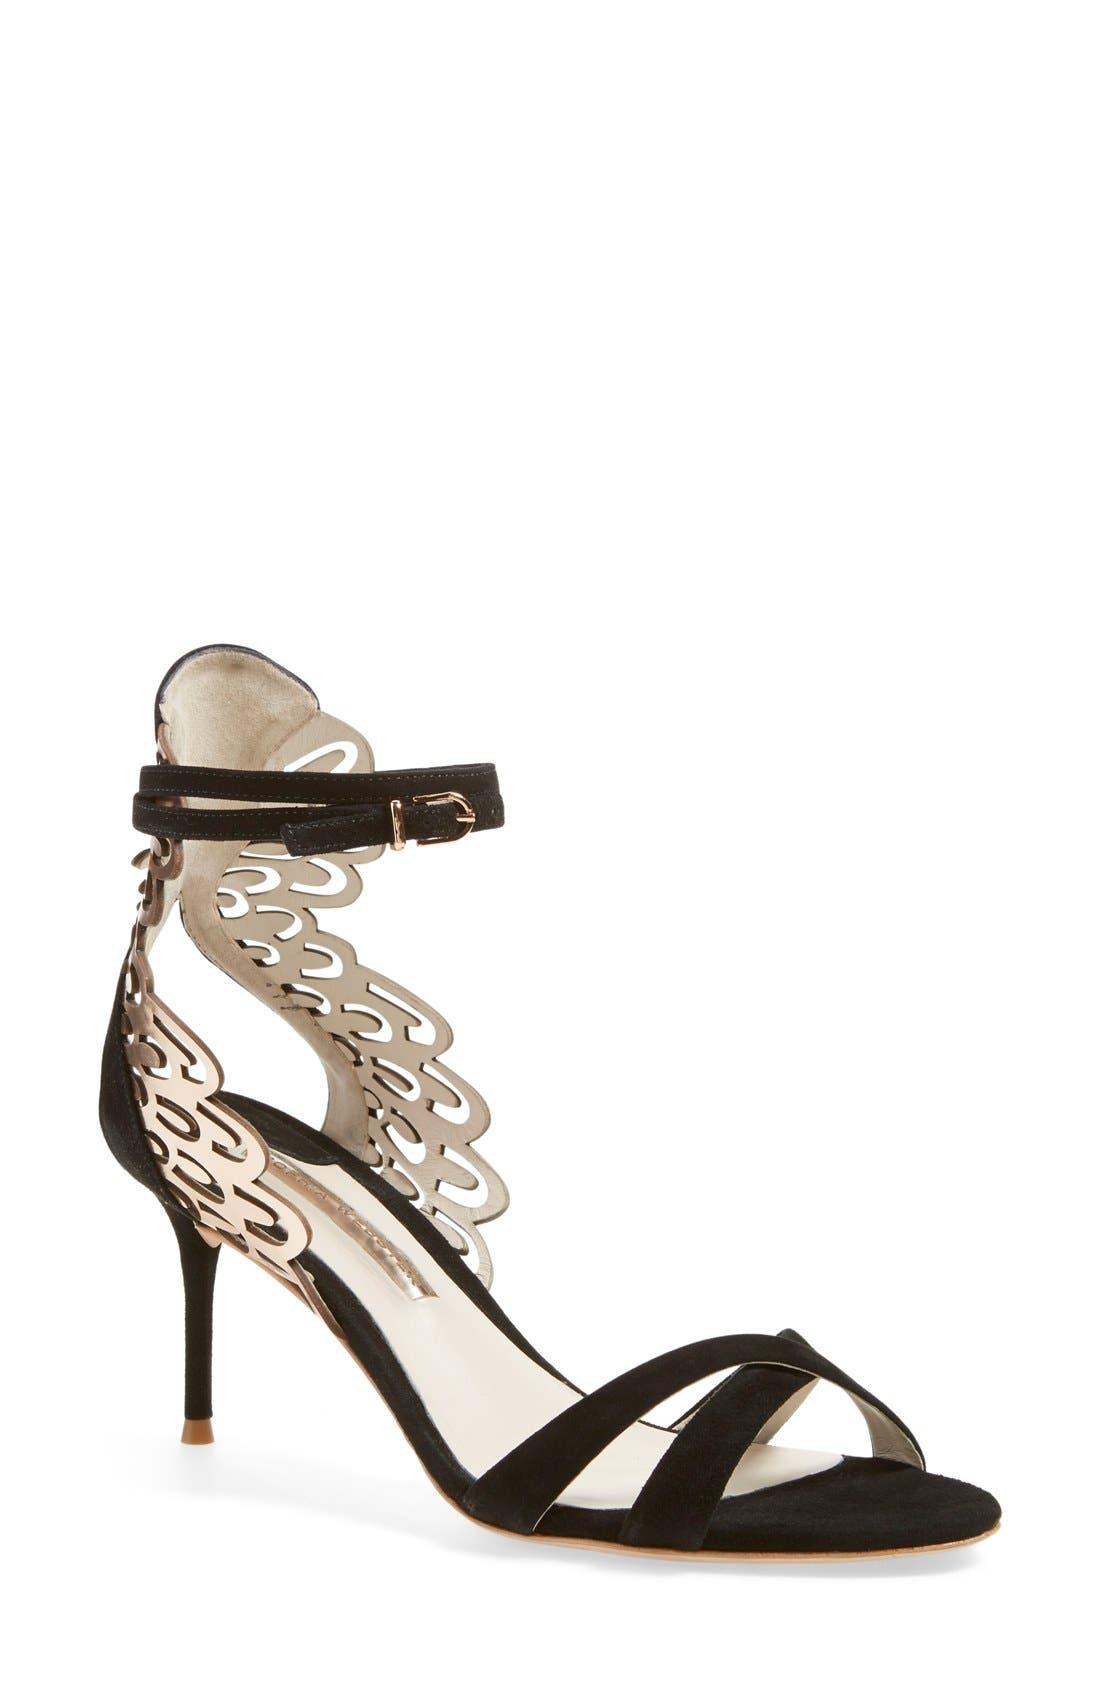 Alternate Image 1 Selected - Sophia Webster 'Micah' Ankle Strap Sandal (Women)